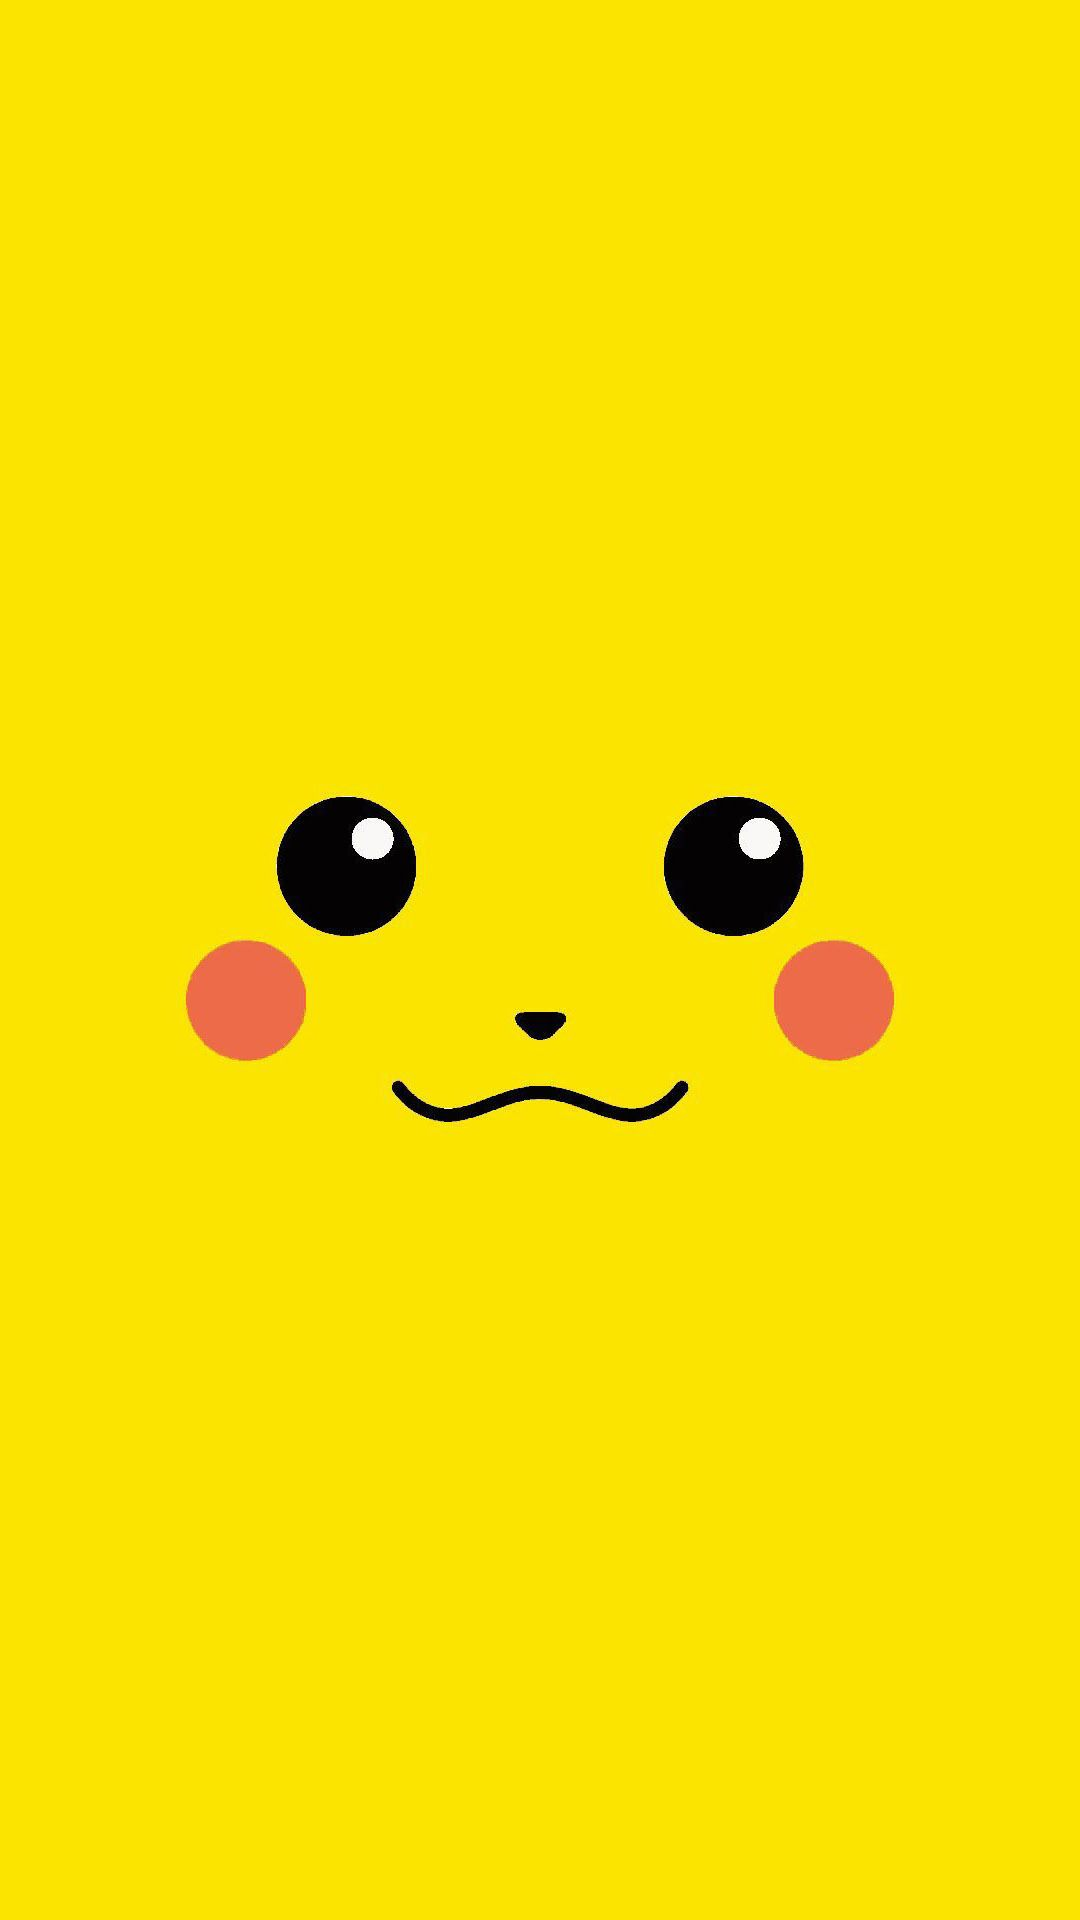 Pokemon Minimalist wallpaper for mobile